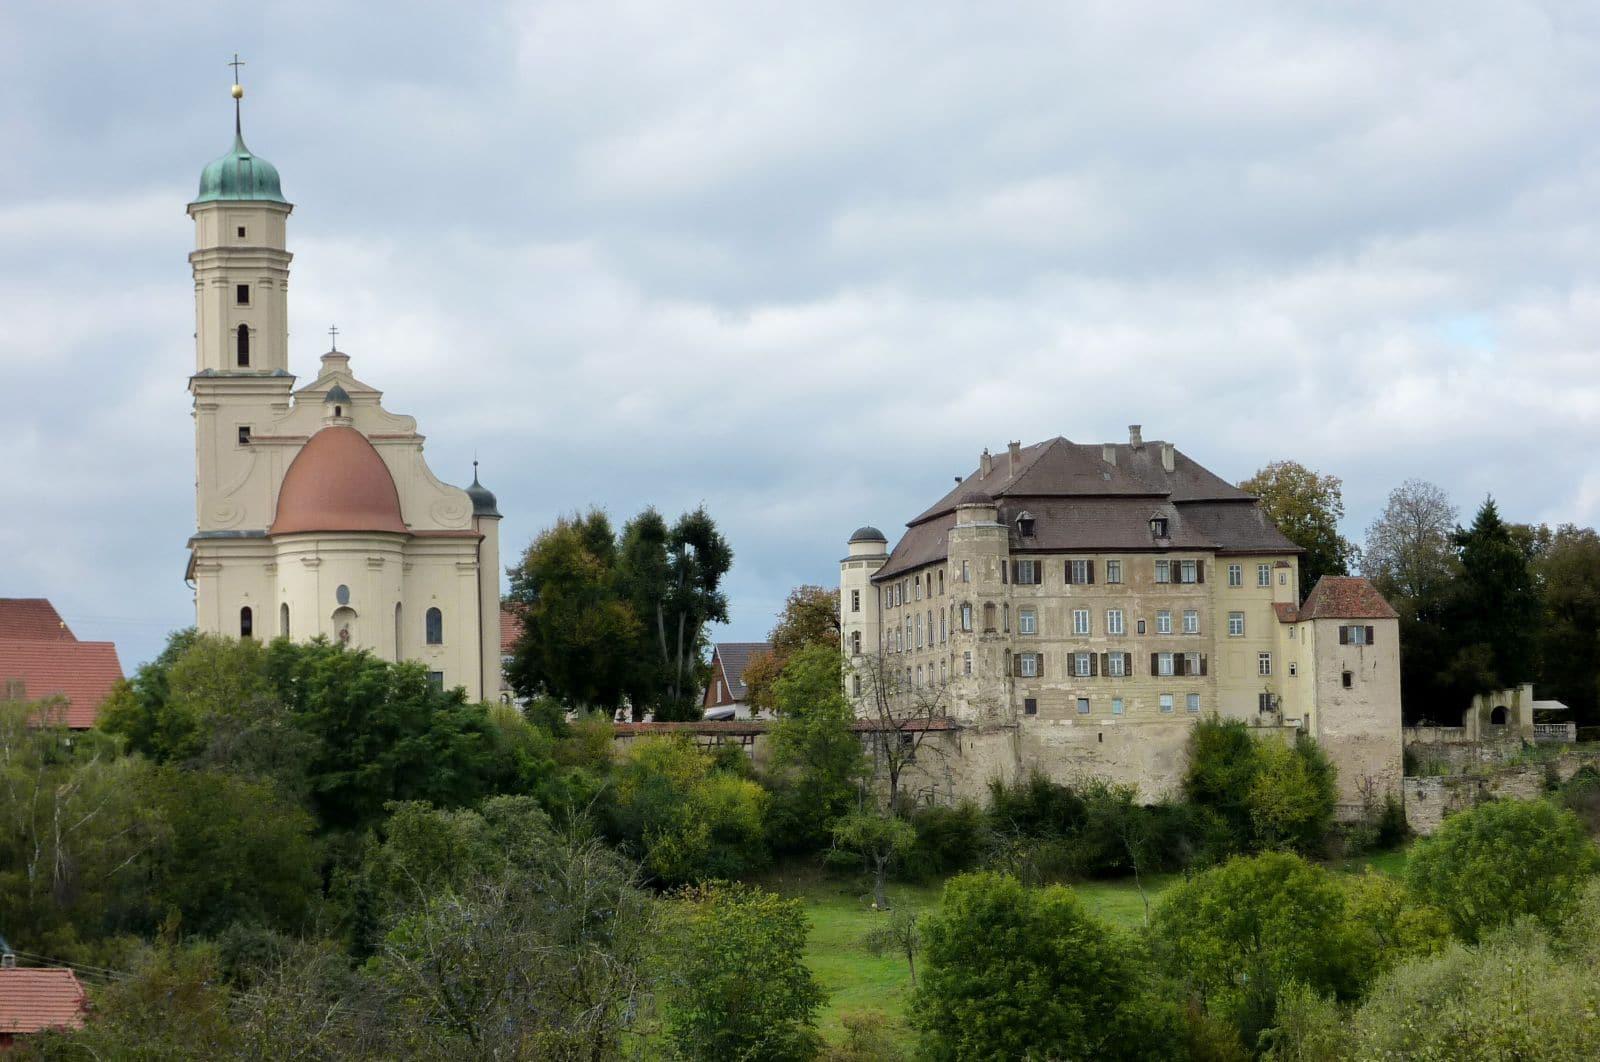 Schloss und Wallfahrtskirche Hohenstadt, @ Schloss Hohenstadt